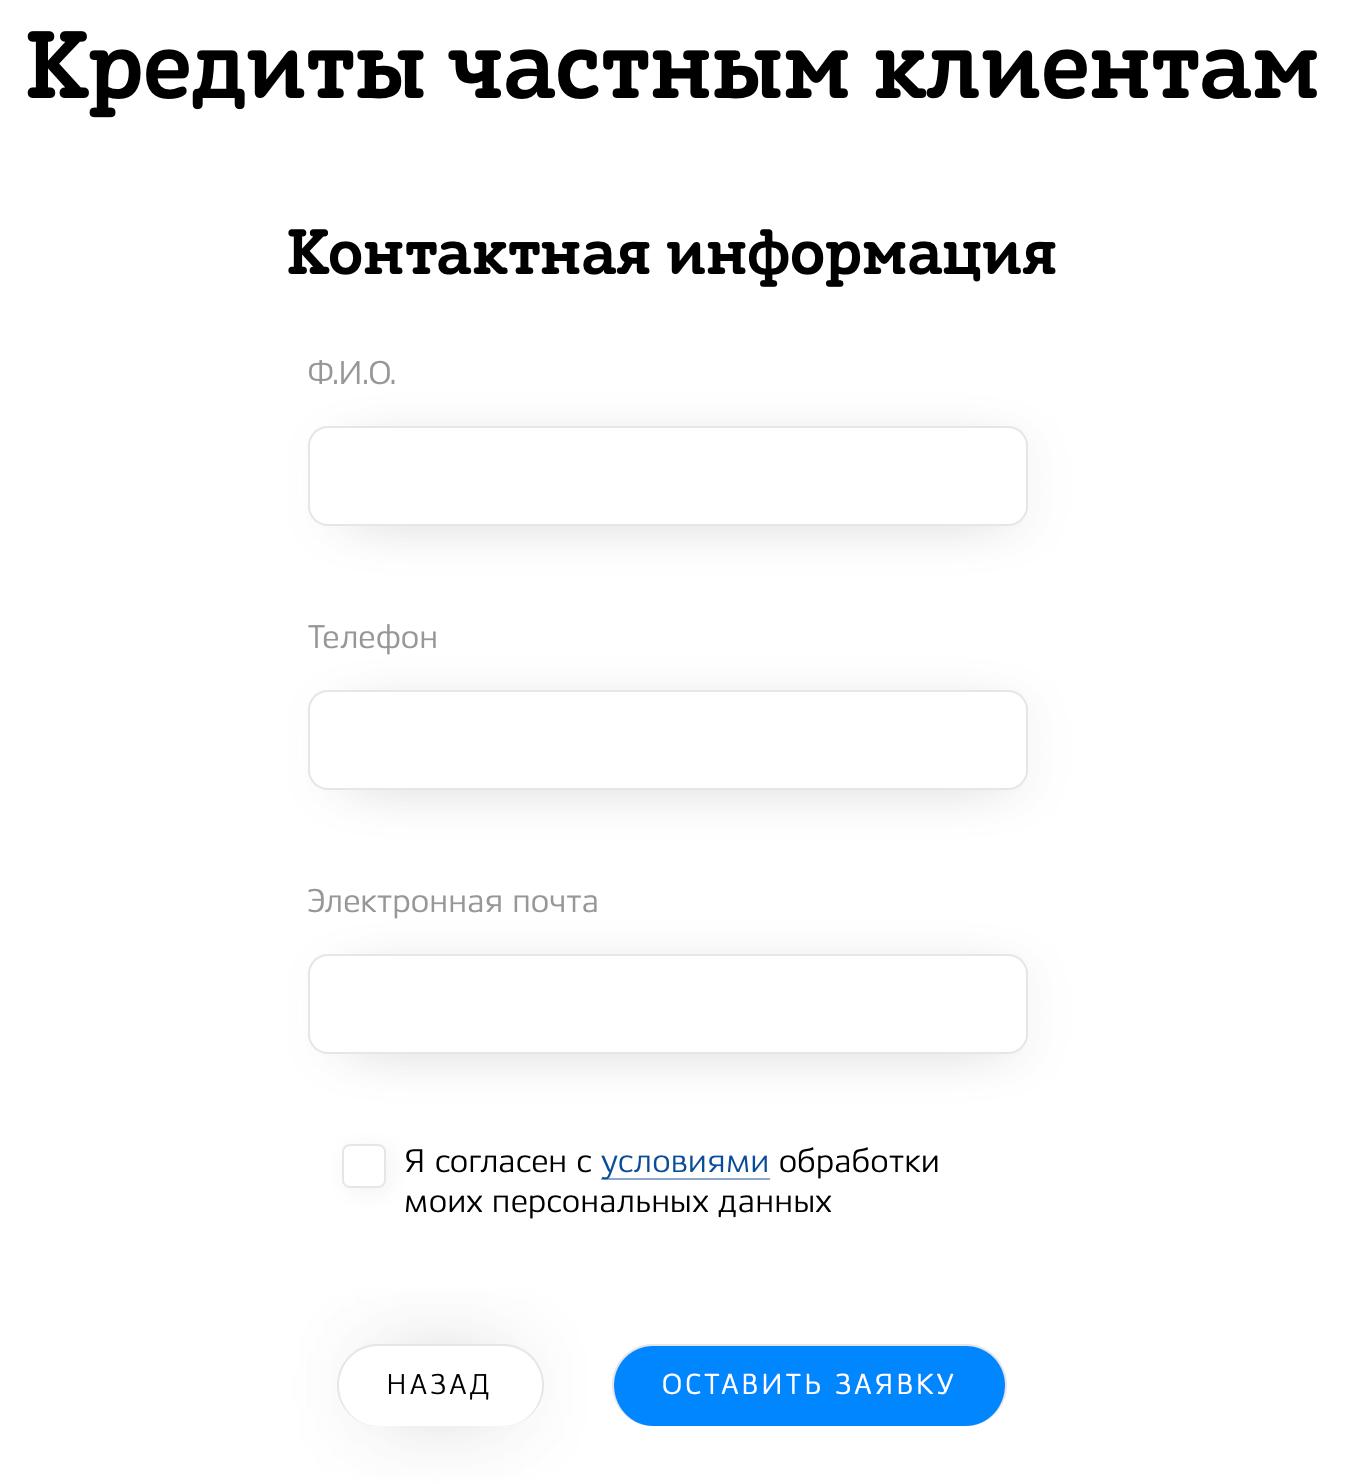 Банк кубань кредит краснодар онлайн заявка банки в севастополе взять кредит